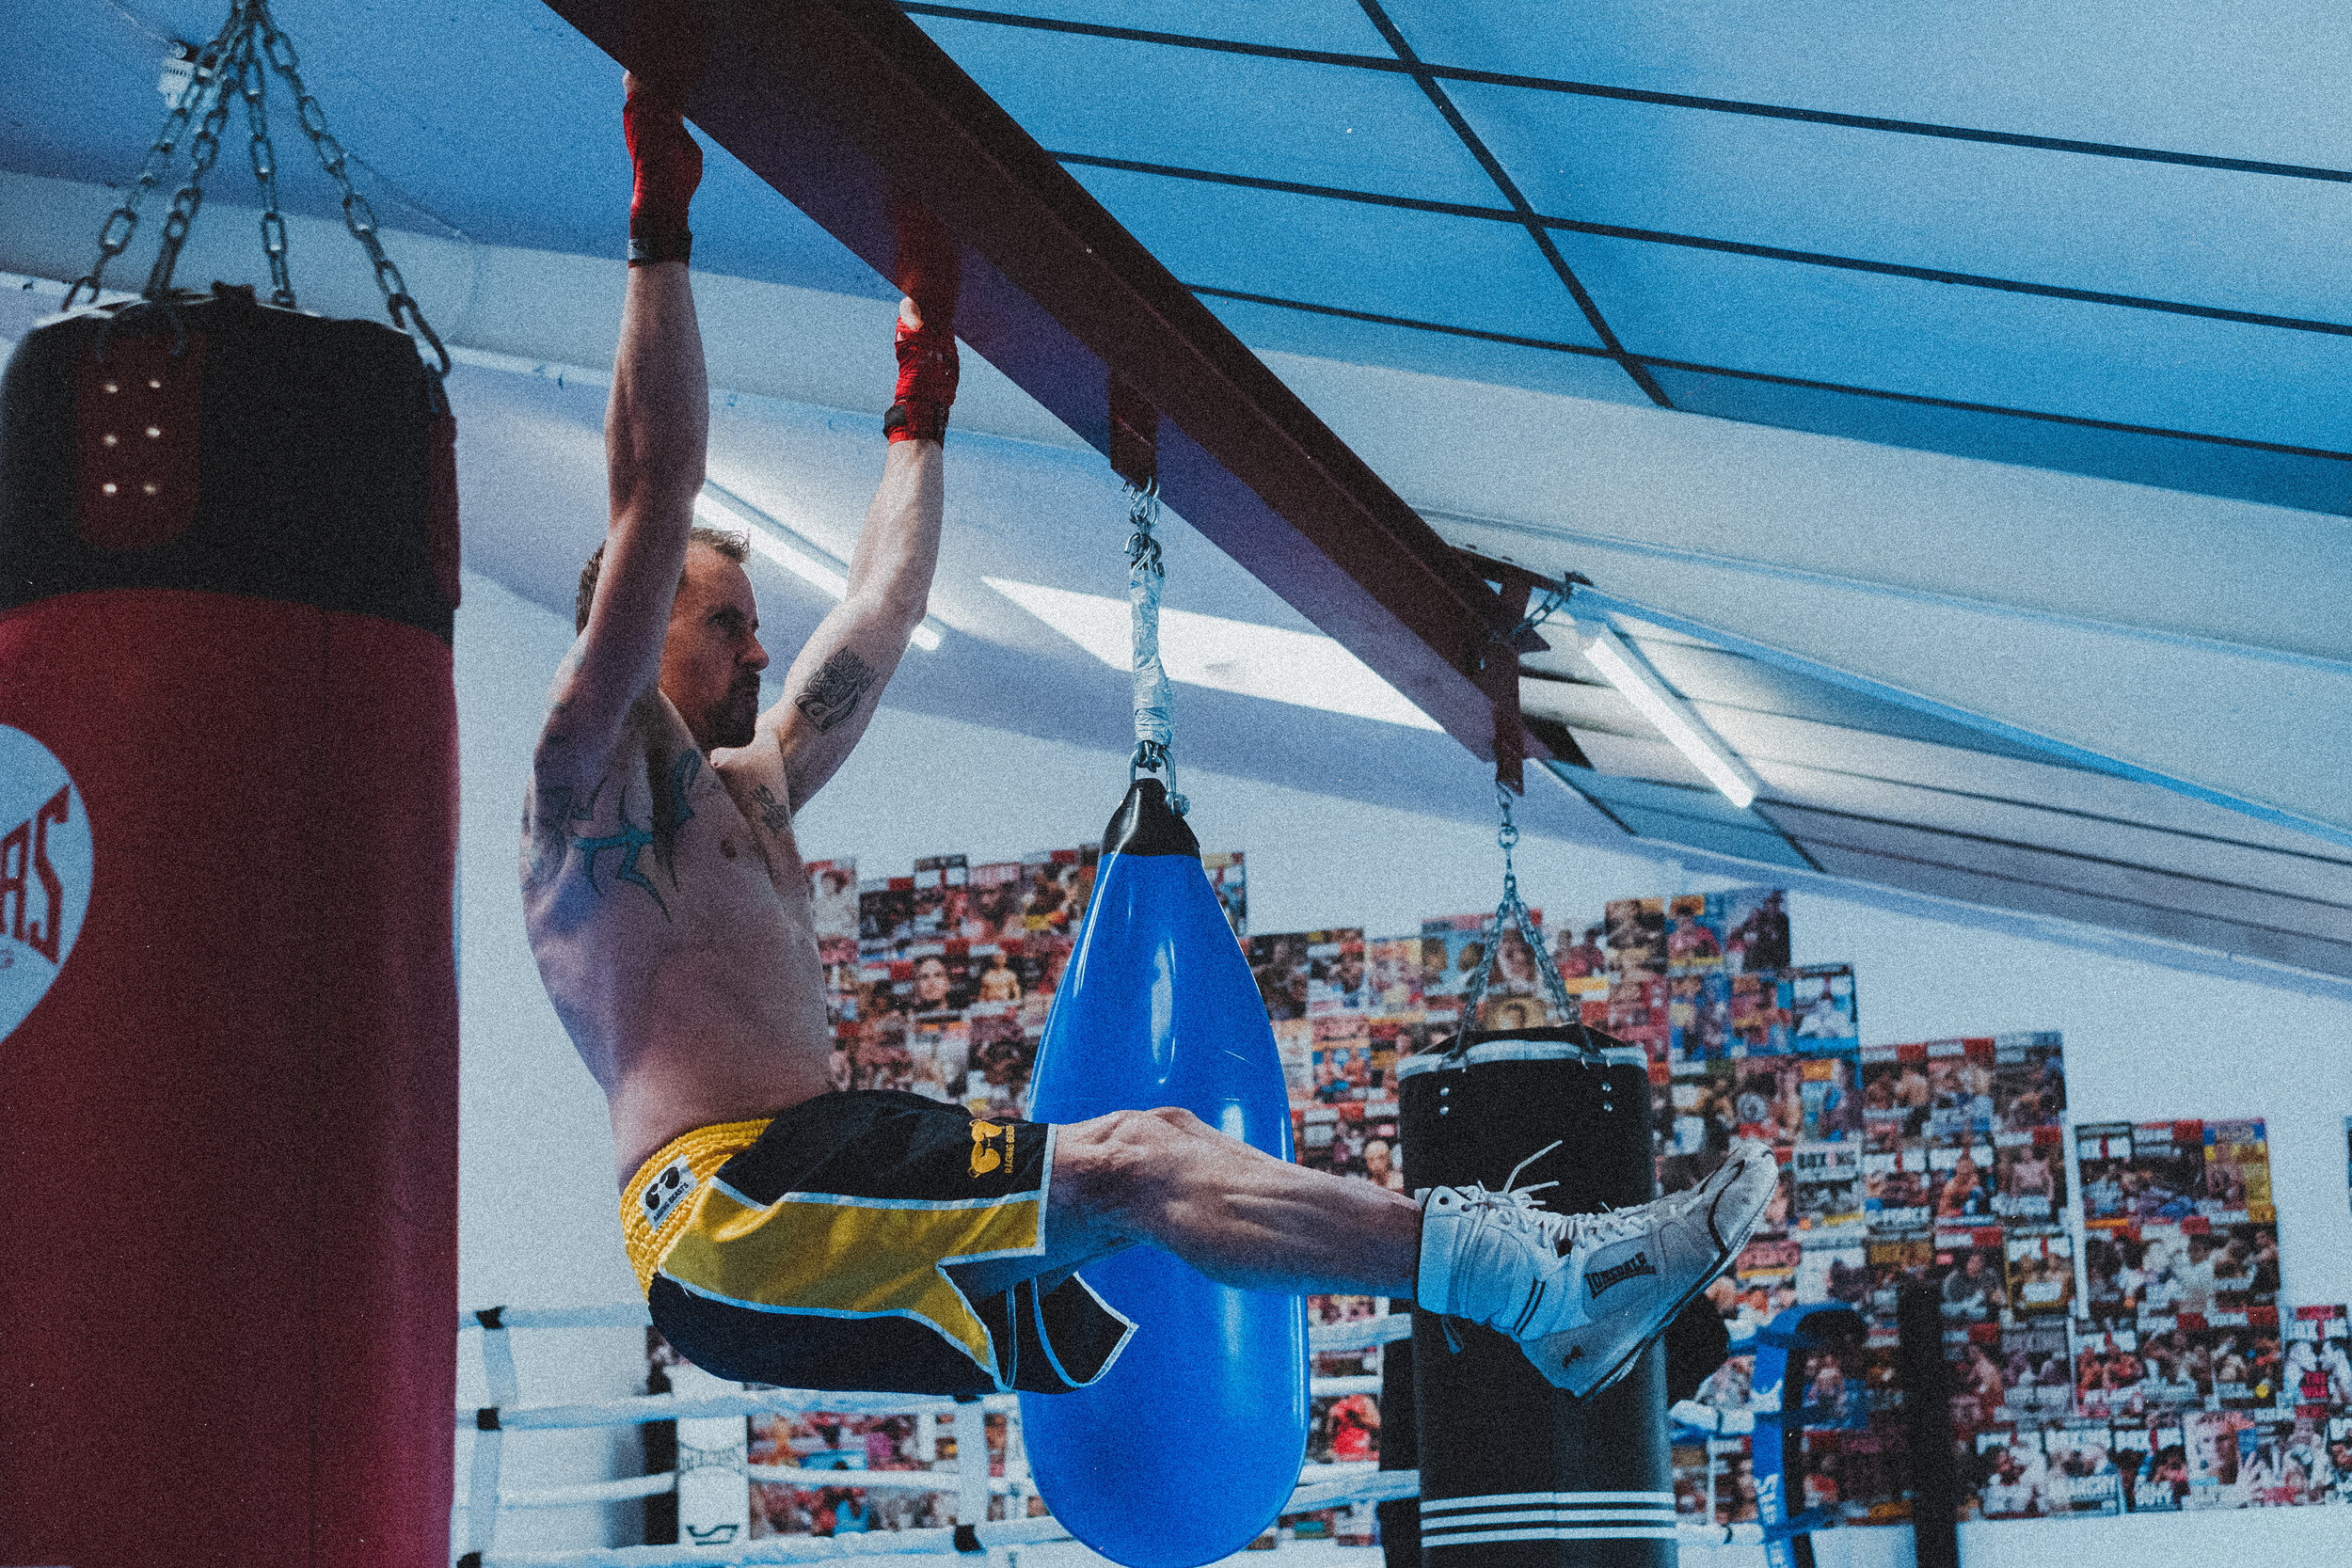 brett boxing session october 2019 (26).jpg